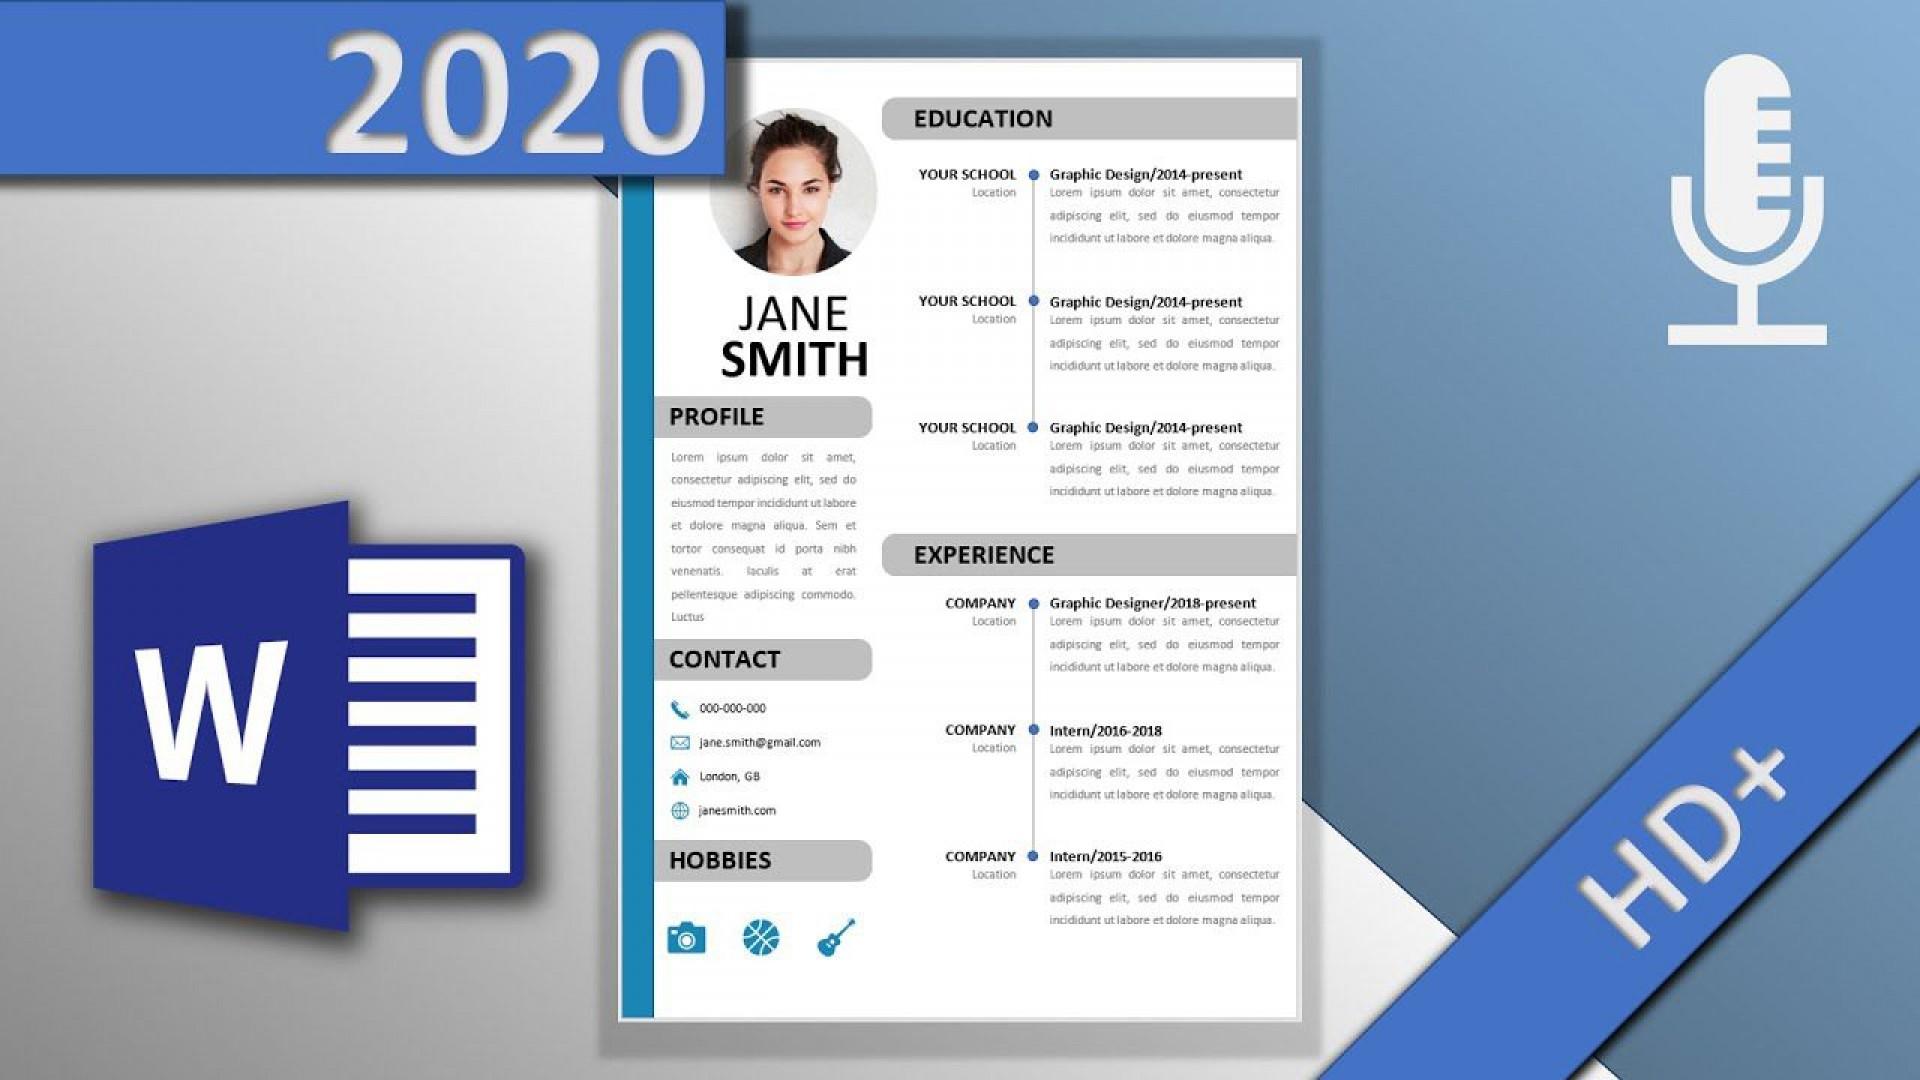 001 Phenomenal Word Resume Template 2020 High Def  Microsoft M1920